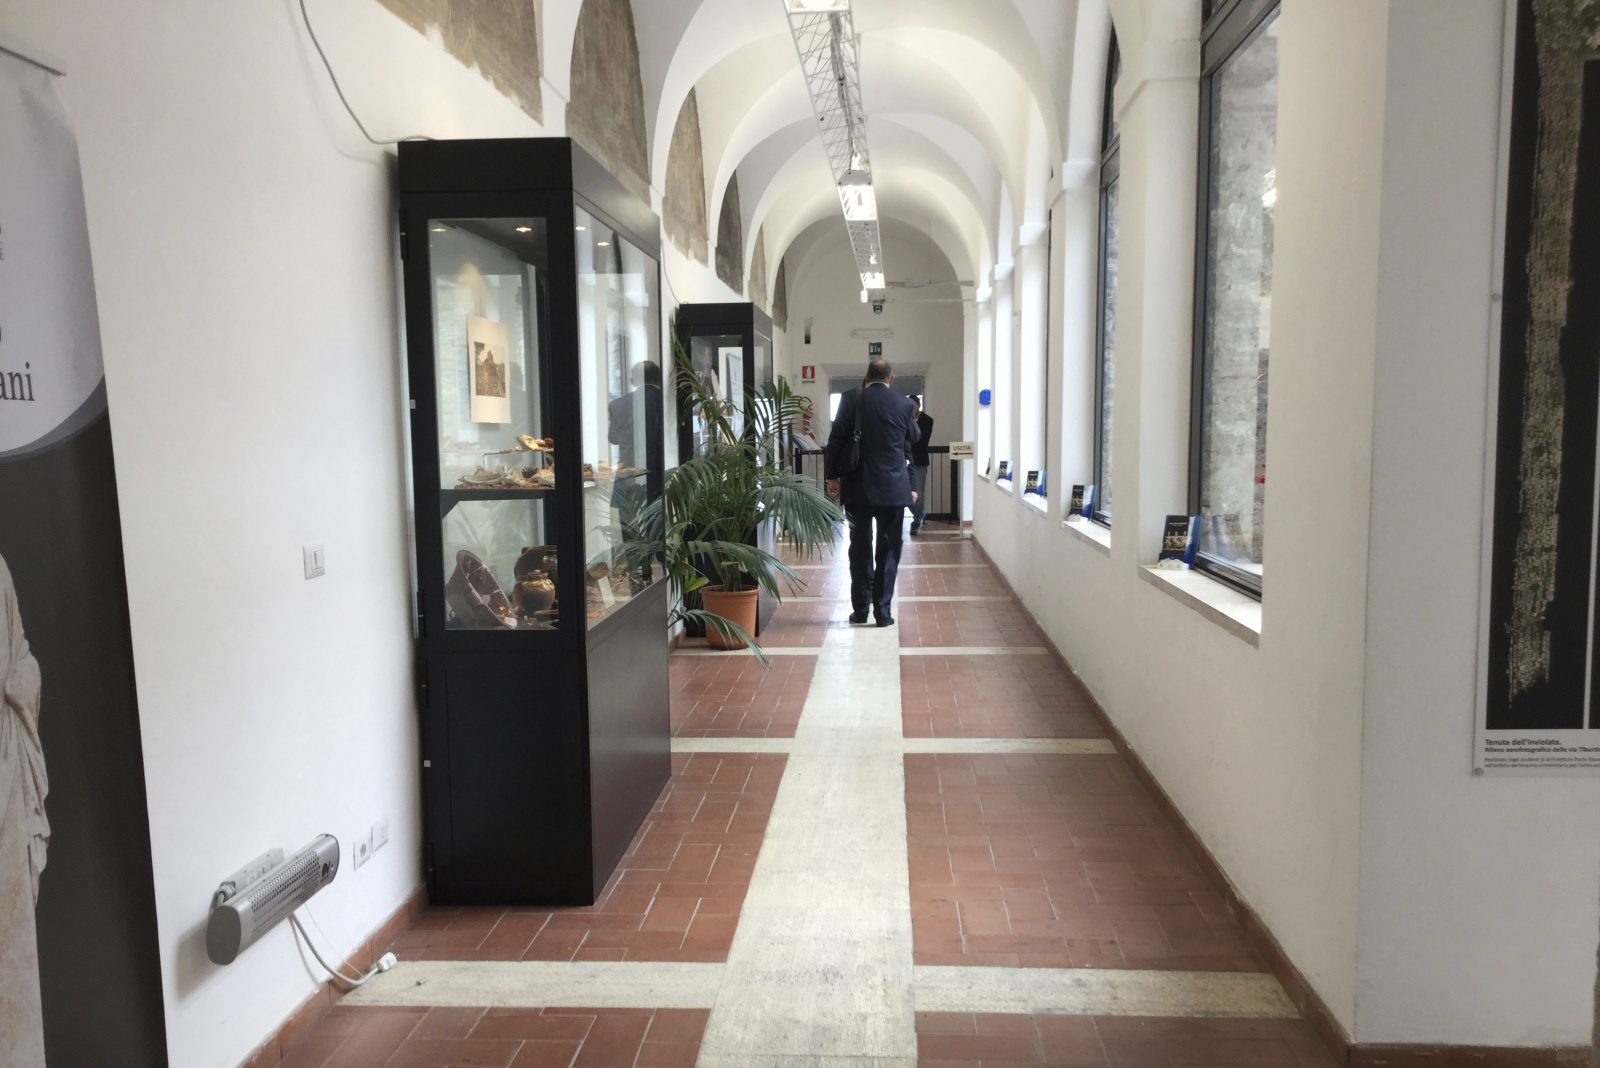 Museo Lanciani - Guidonia Montecelio